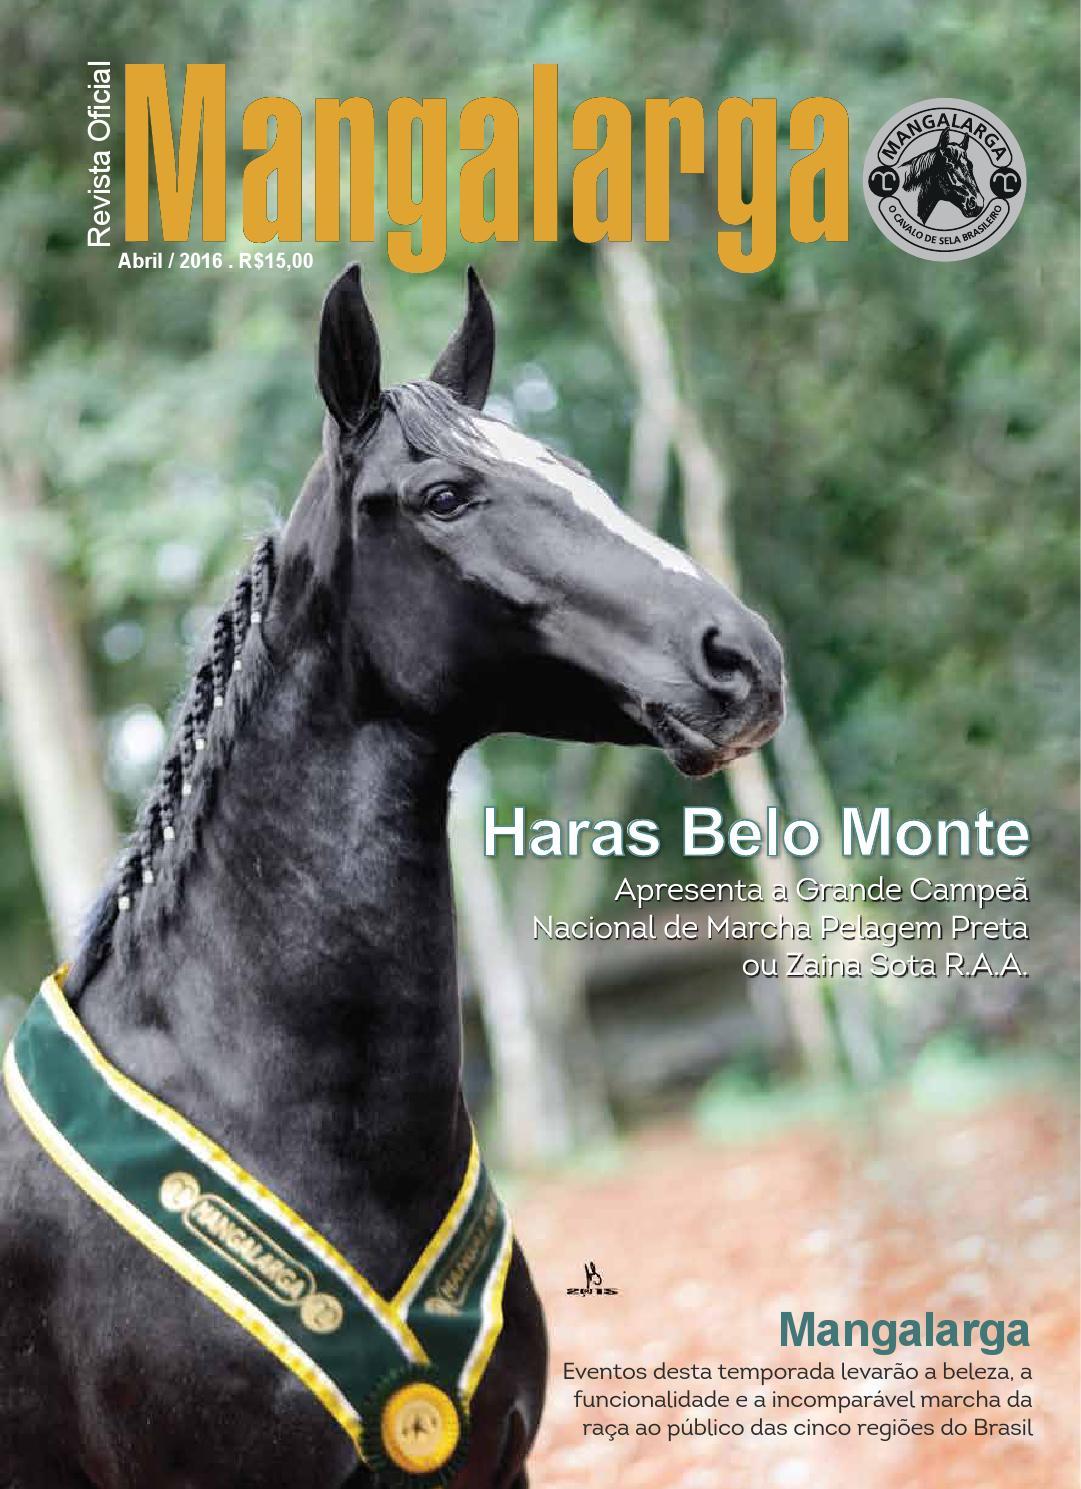 Revista mangalarga internet abril 2016 by abccrm angalarga - issuu a2ae5156427